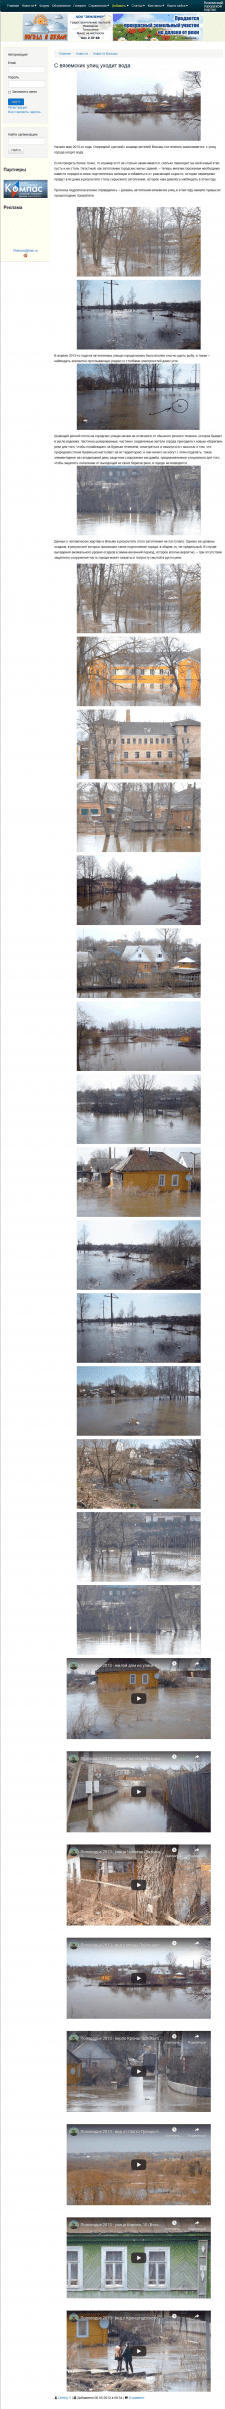 С вяземских улиц уходит вода